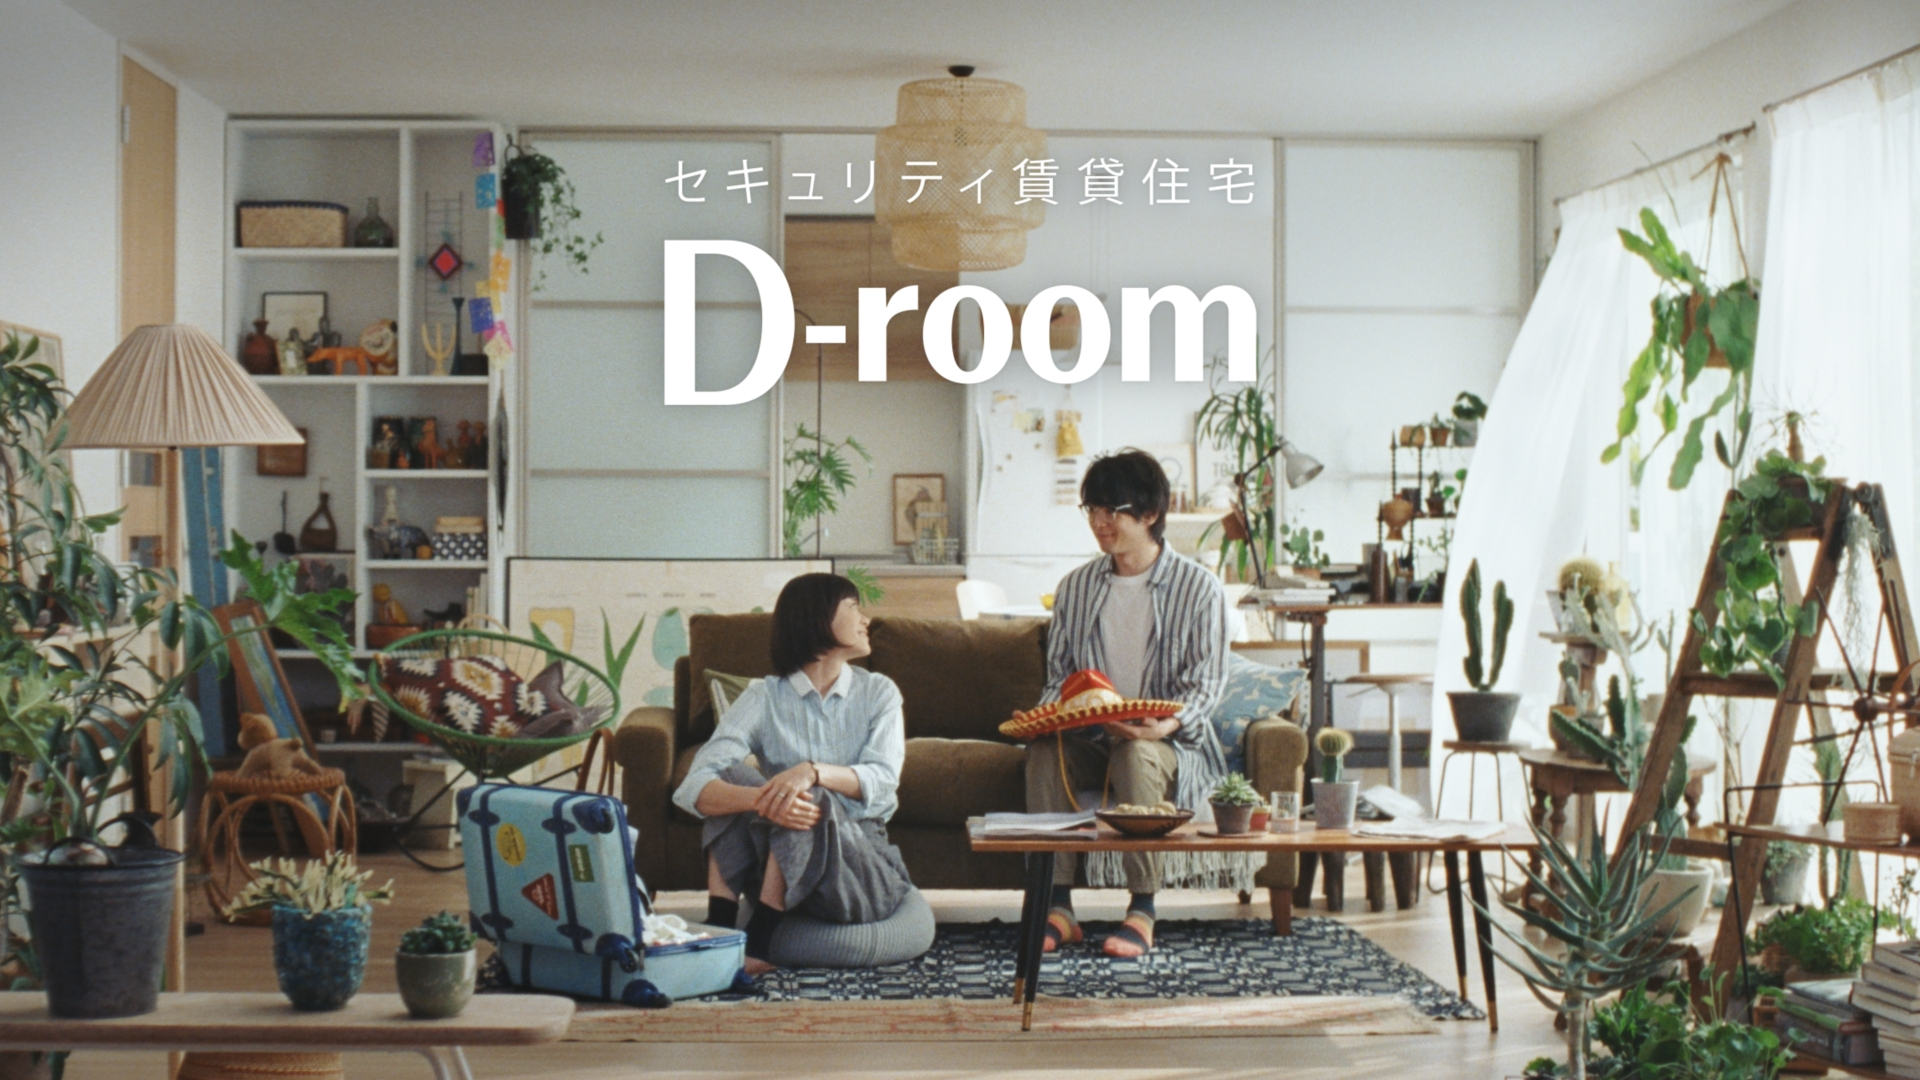 上野樹里/大和ハウス工業・D-room新CM ・「妻、出張中」篇